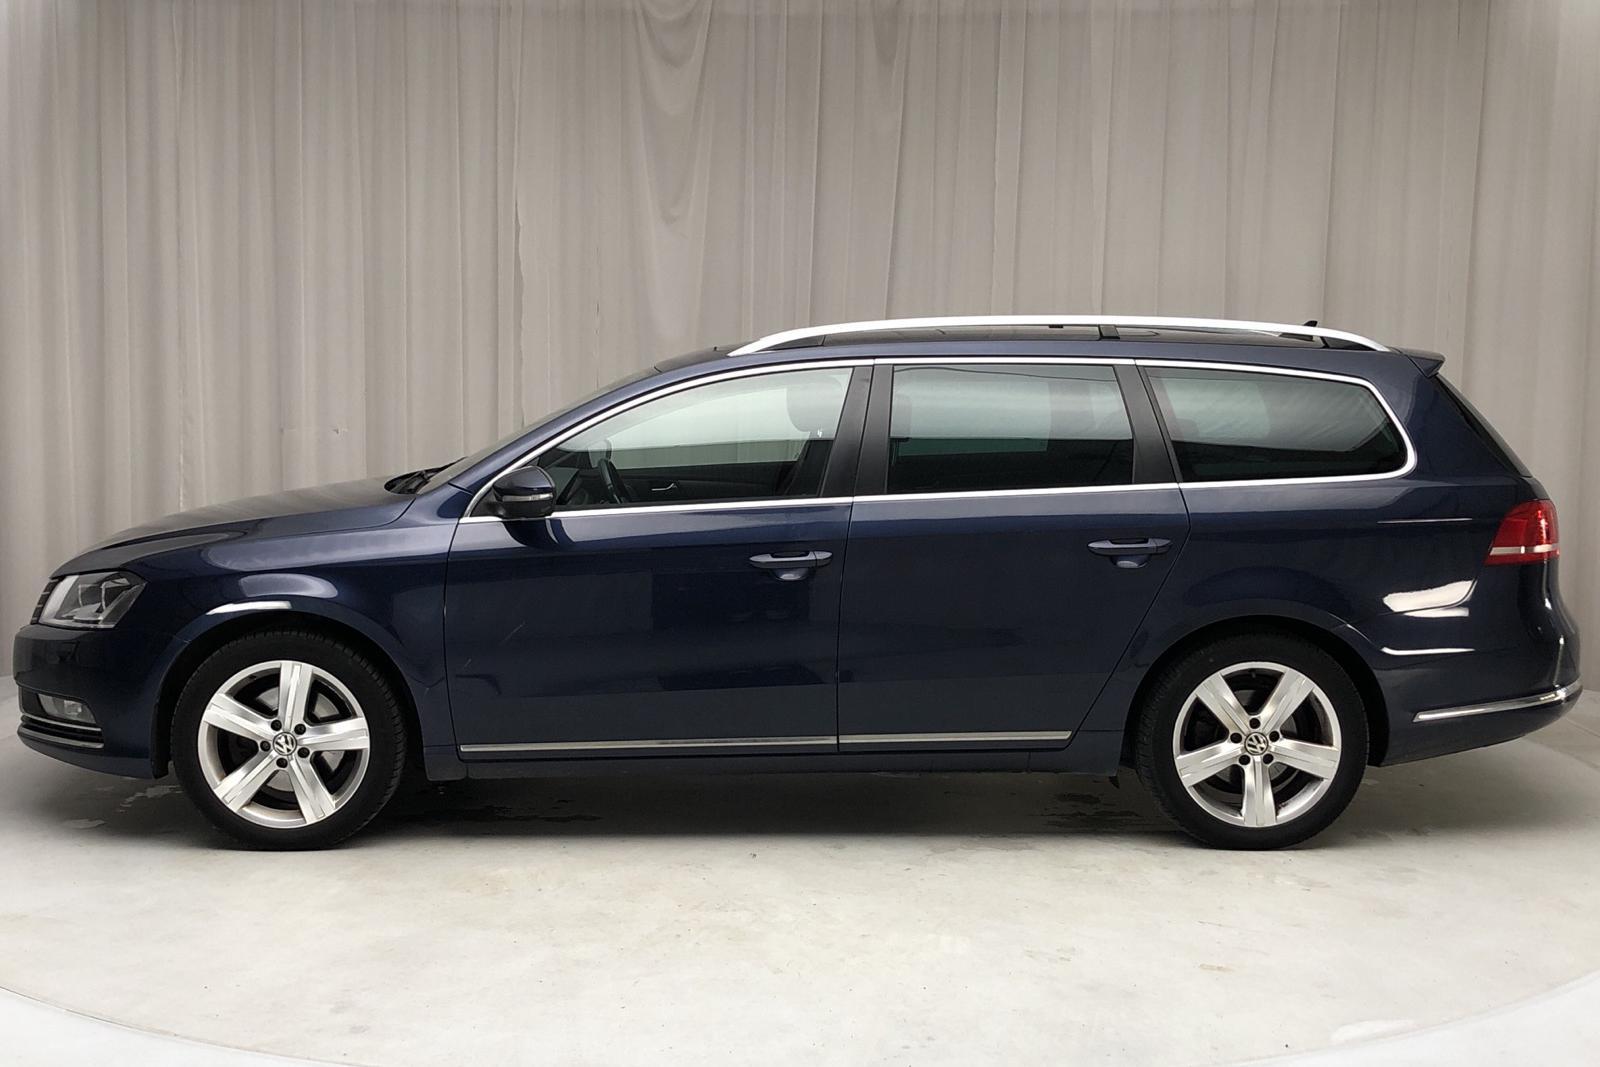 VW Passat 1.4 TSI EcoFuel Variant (150hk) - 190 000 km - Manual - Dark Blue - 2012